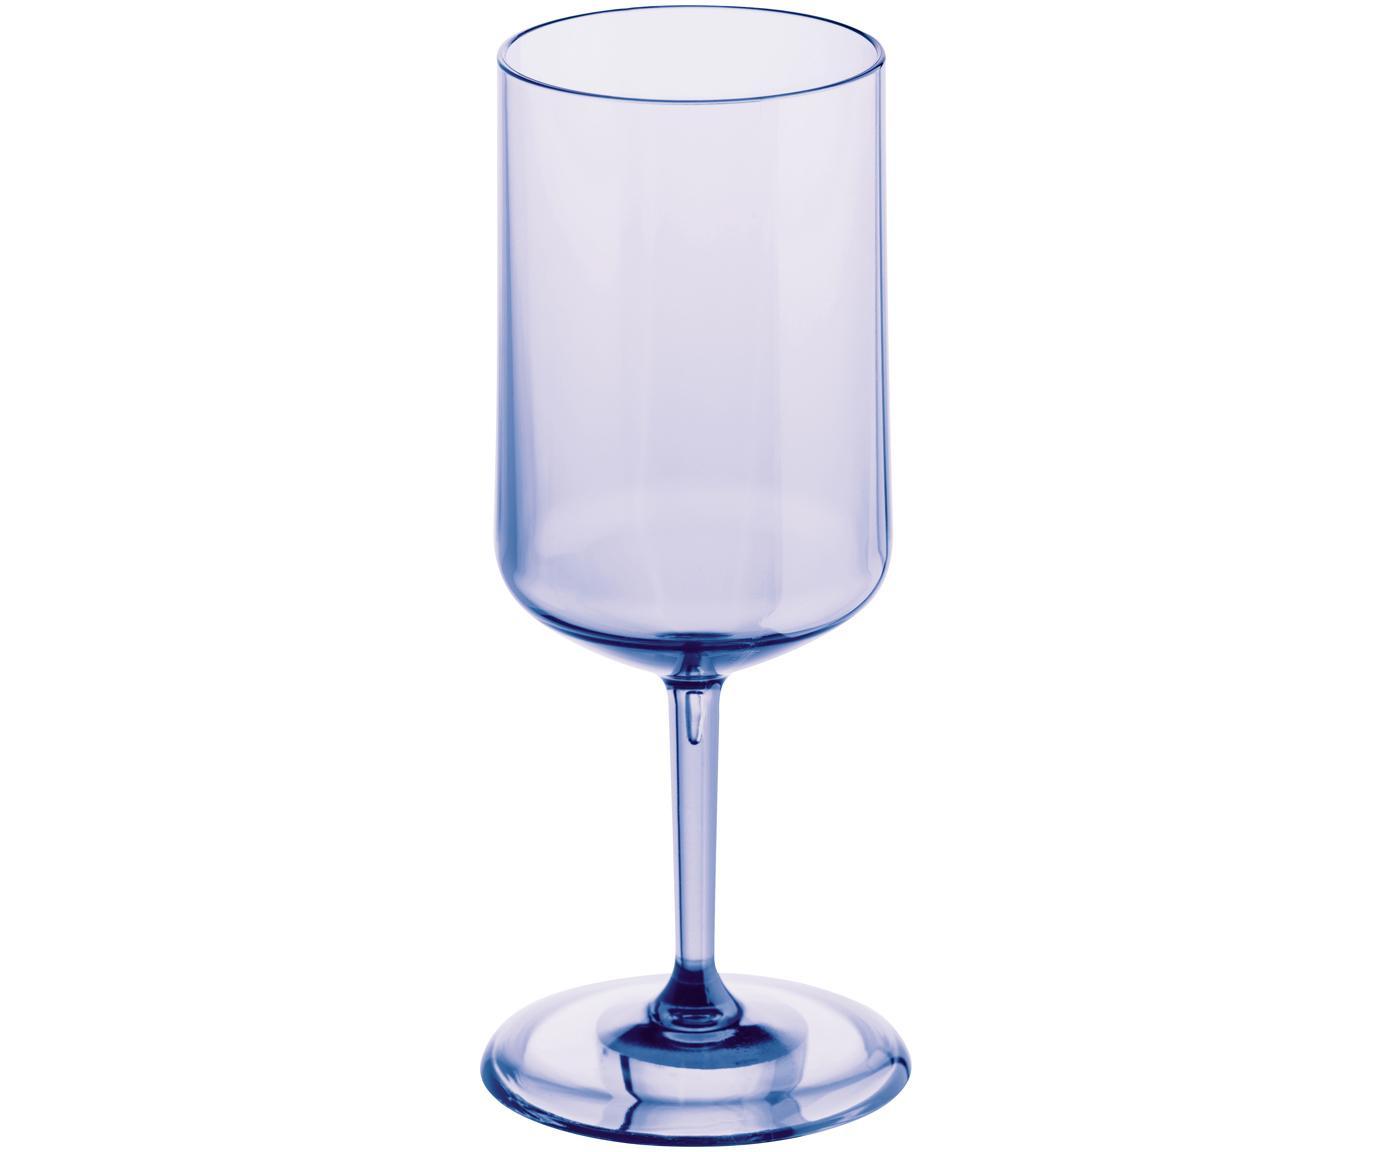 Bicchiere da vino bianco Cheers, Materiale sintetico termoplastico (Superglass), Lilla blu trasparente, Ø 9 x Alt. 21 cm